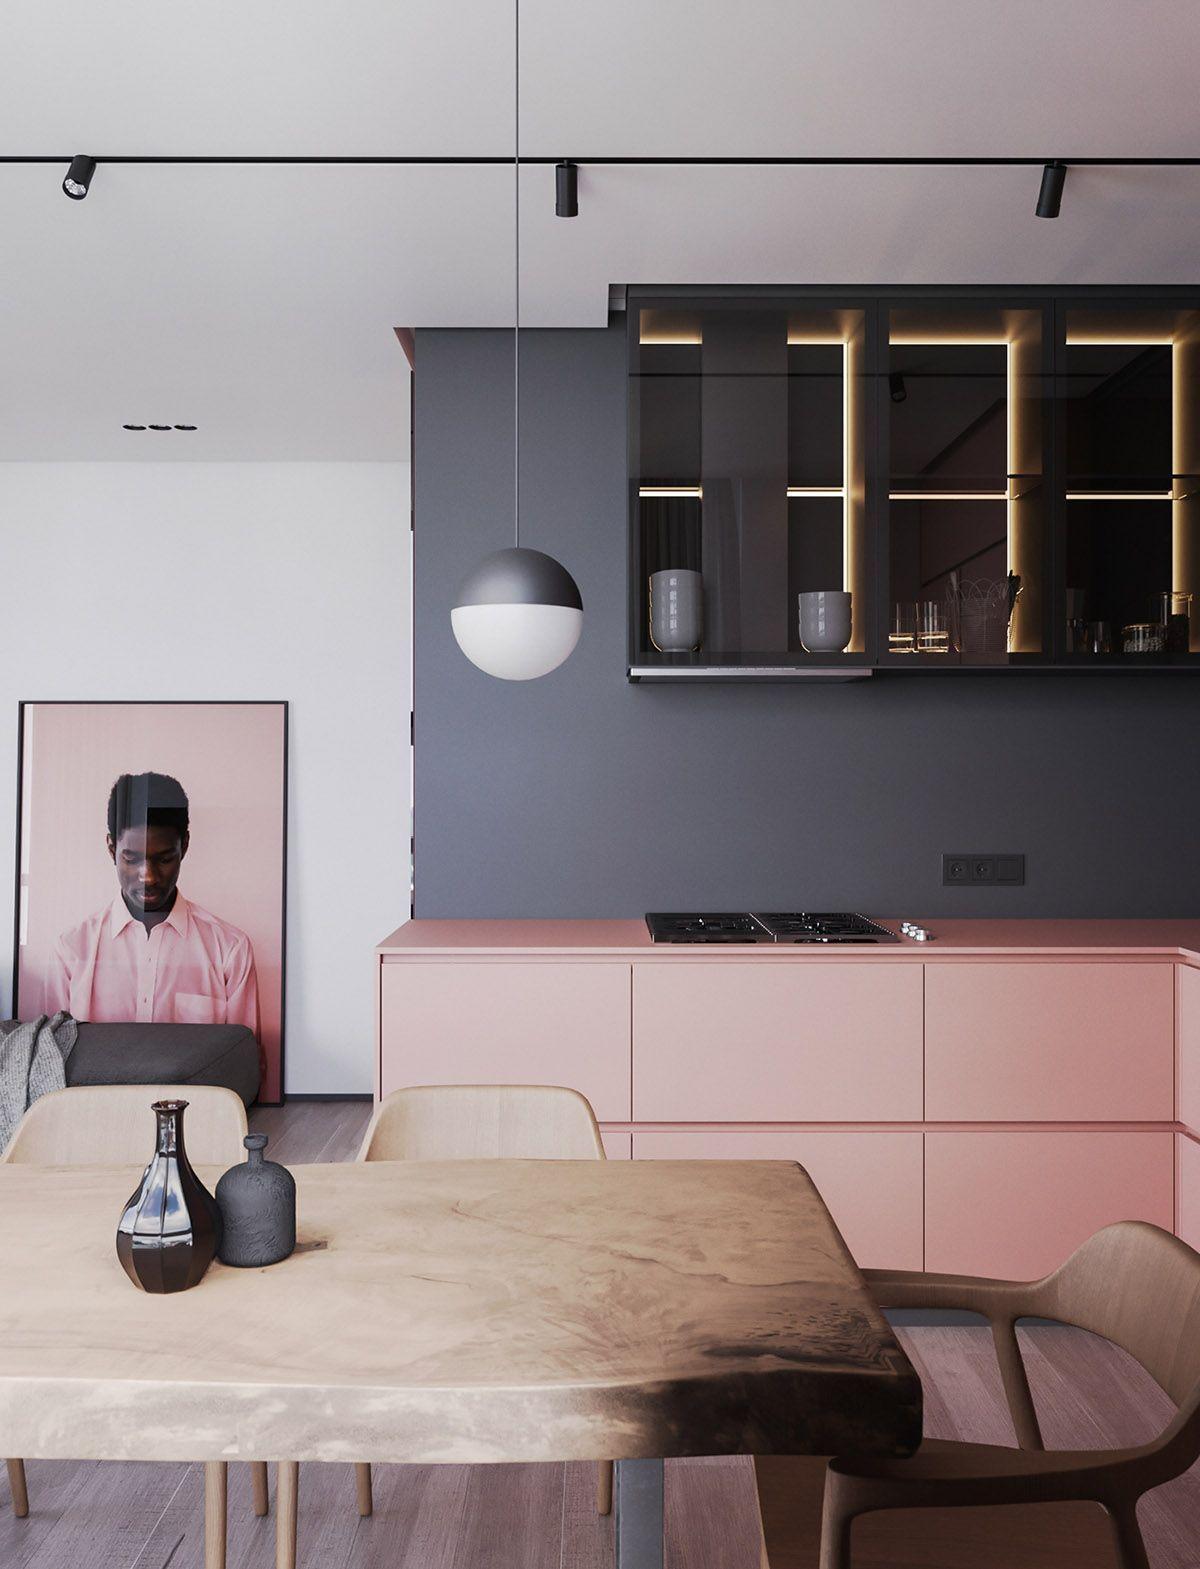 Best home decor design ideas for  better interior project visit us the also rh nl pinterest